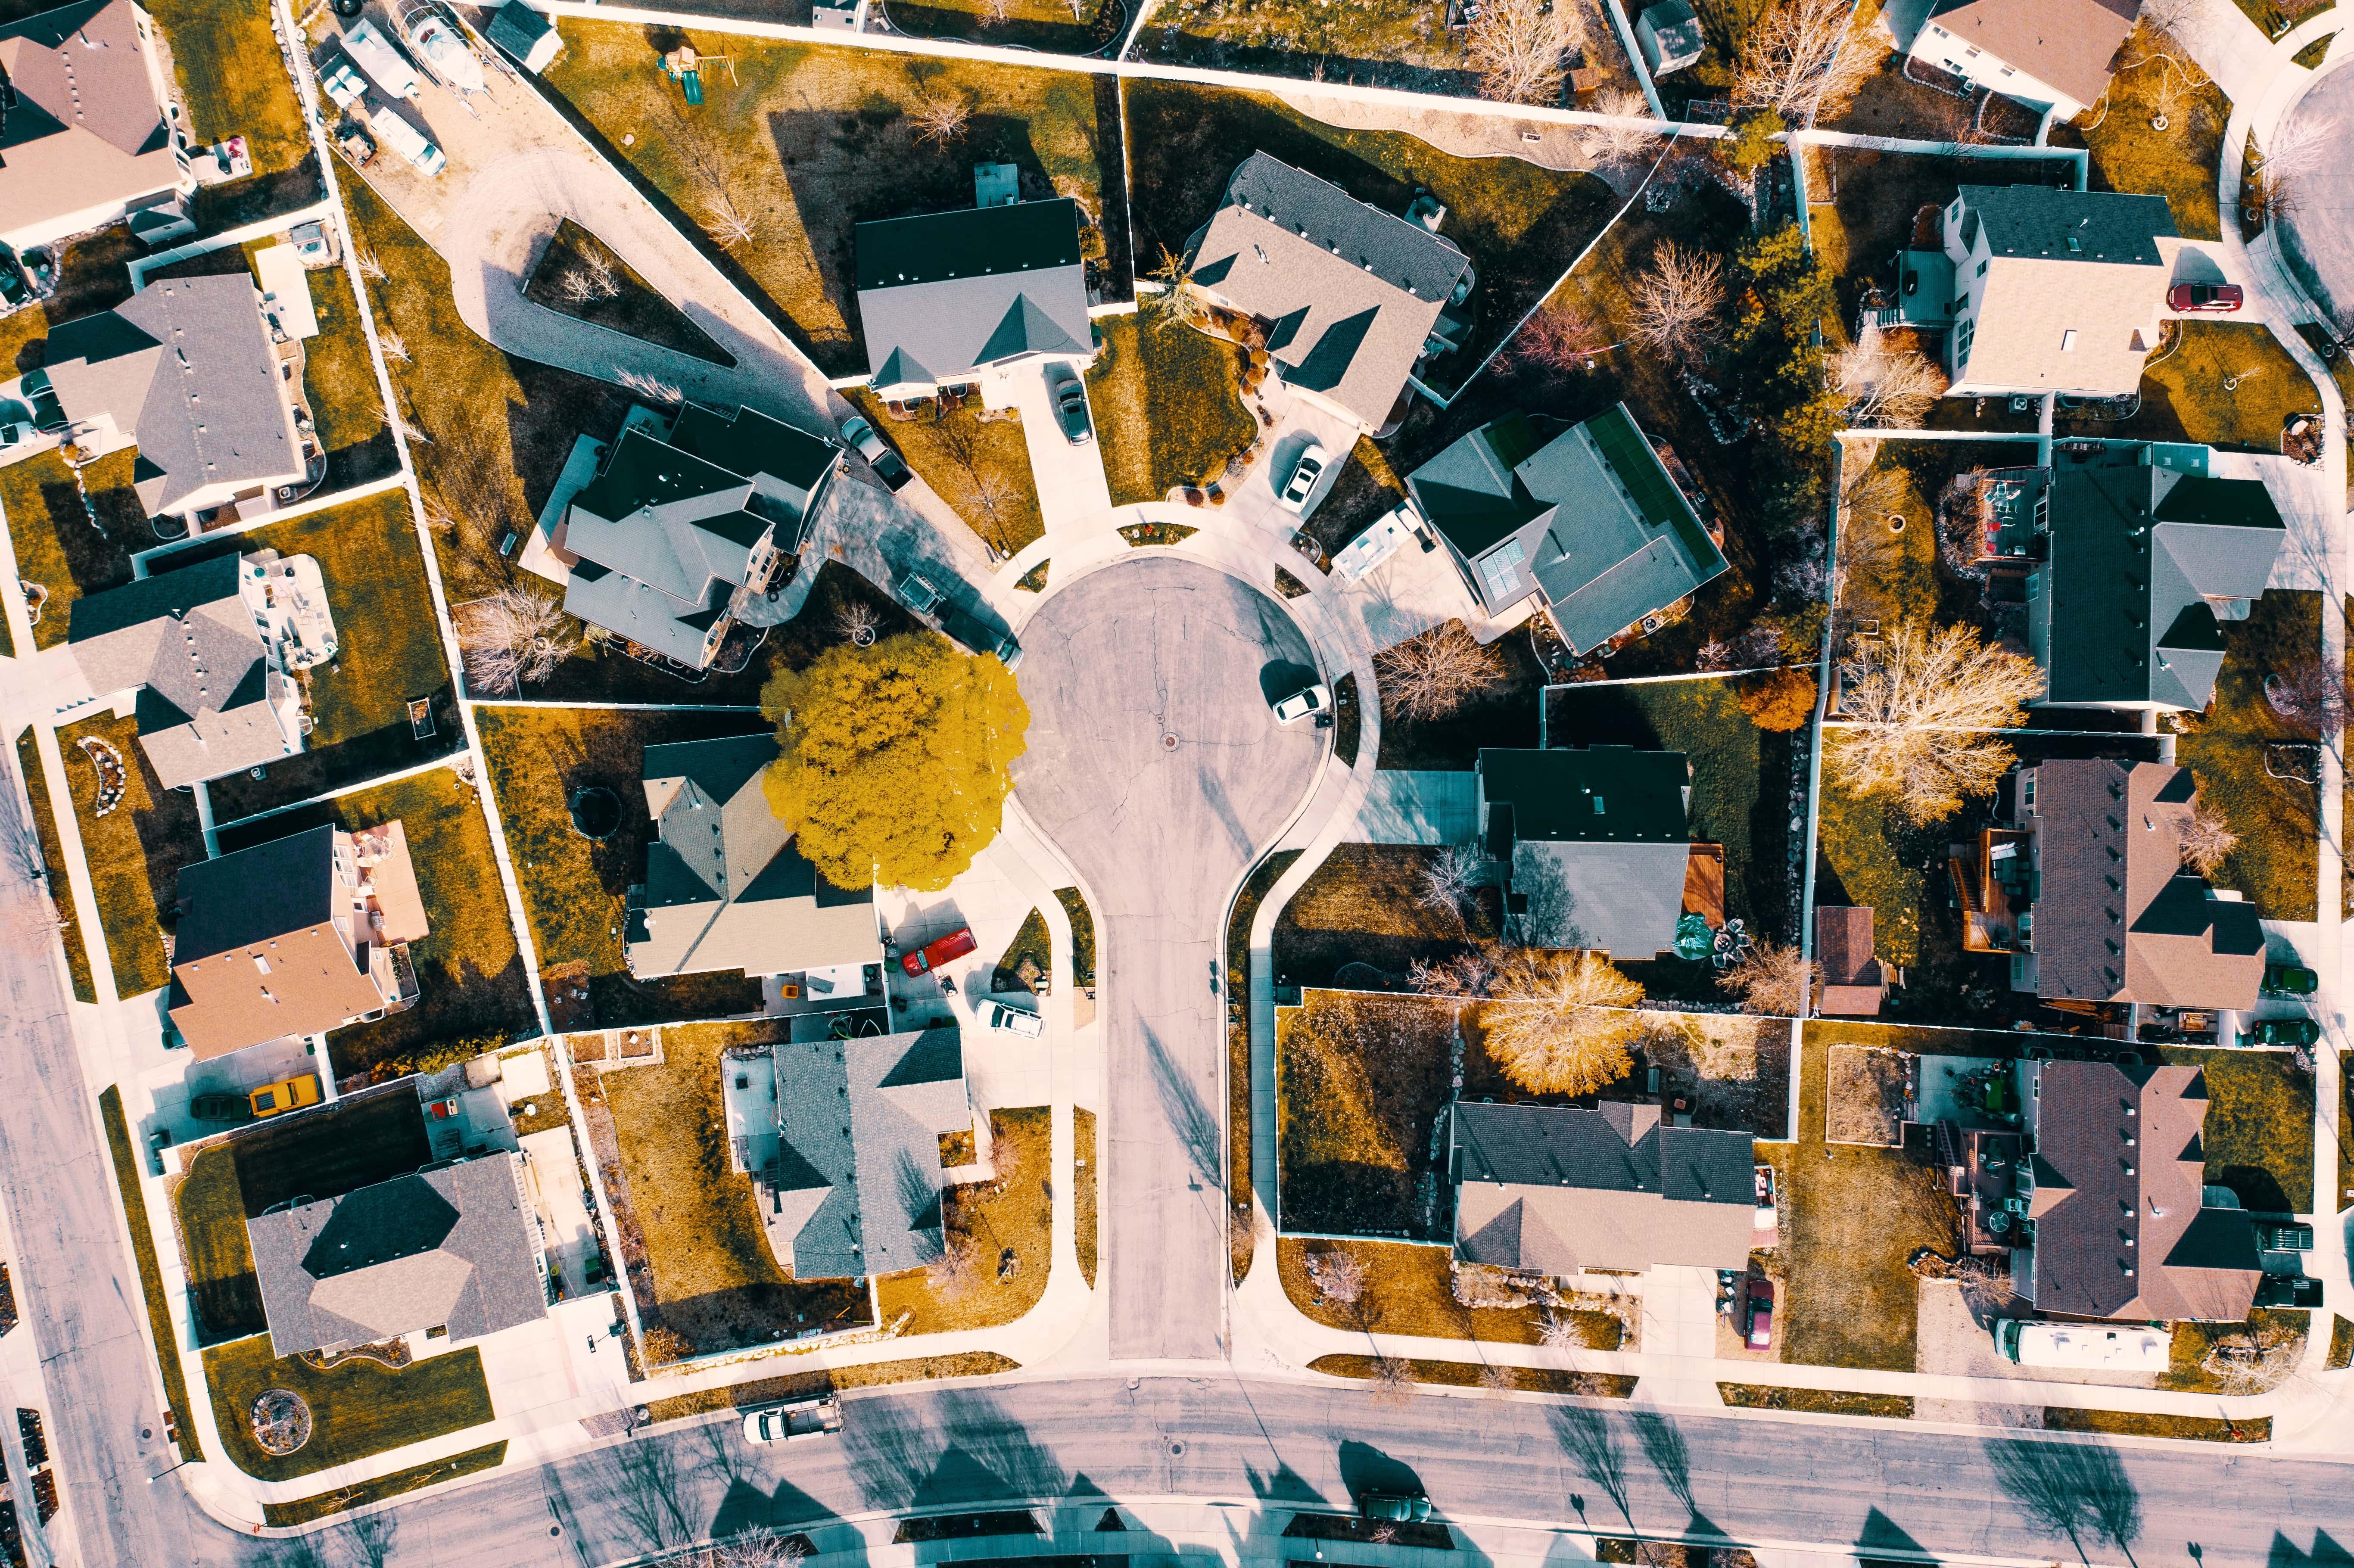 bird's eye view of a suburban roundabout